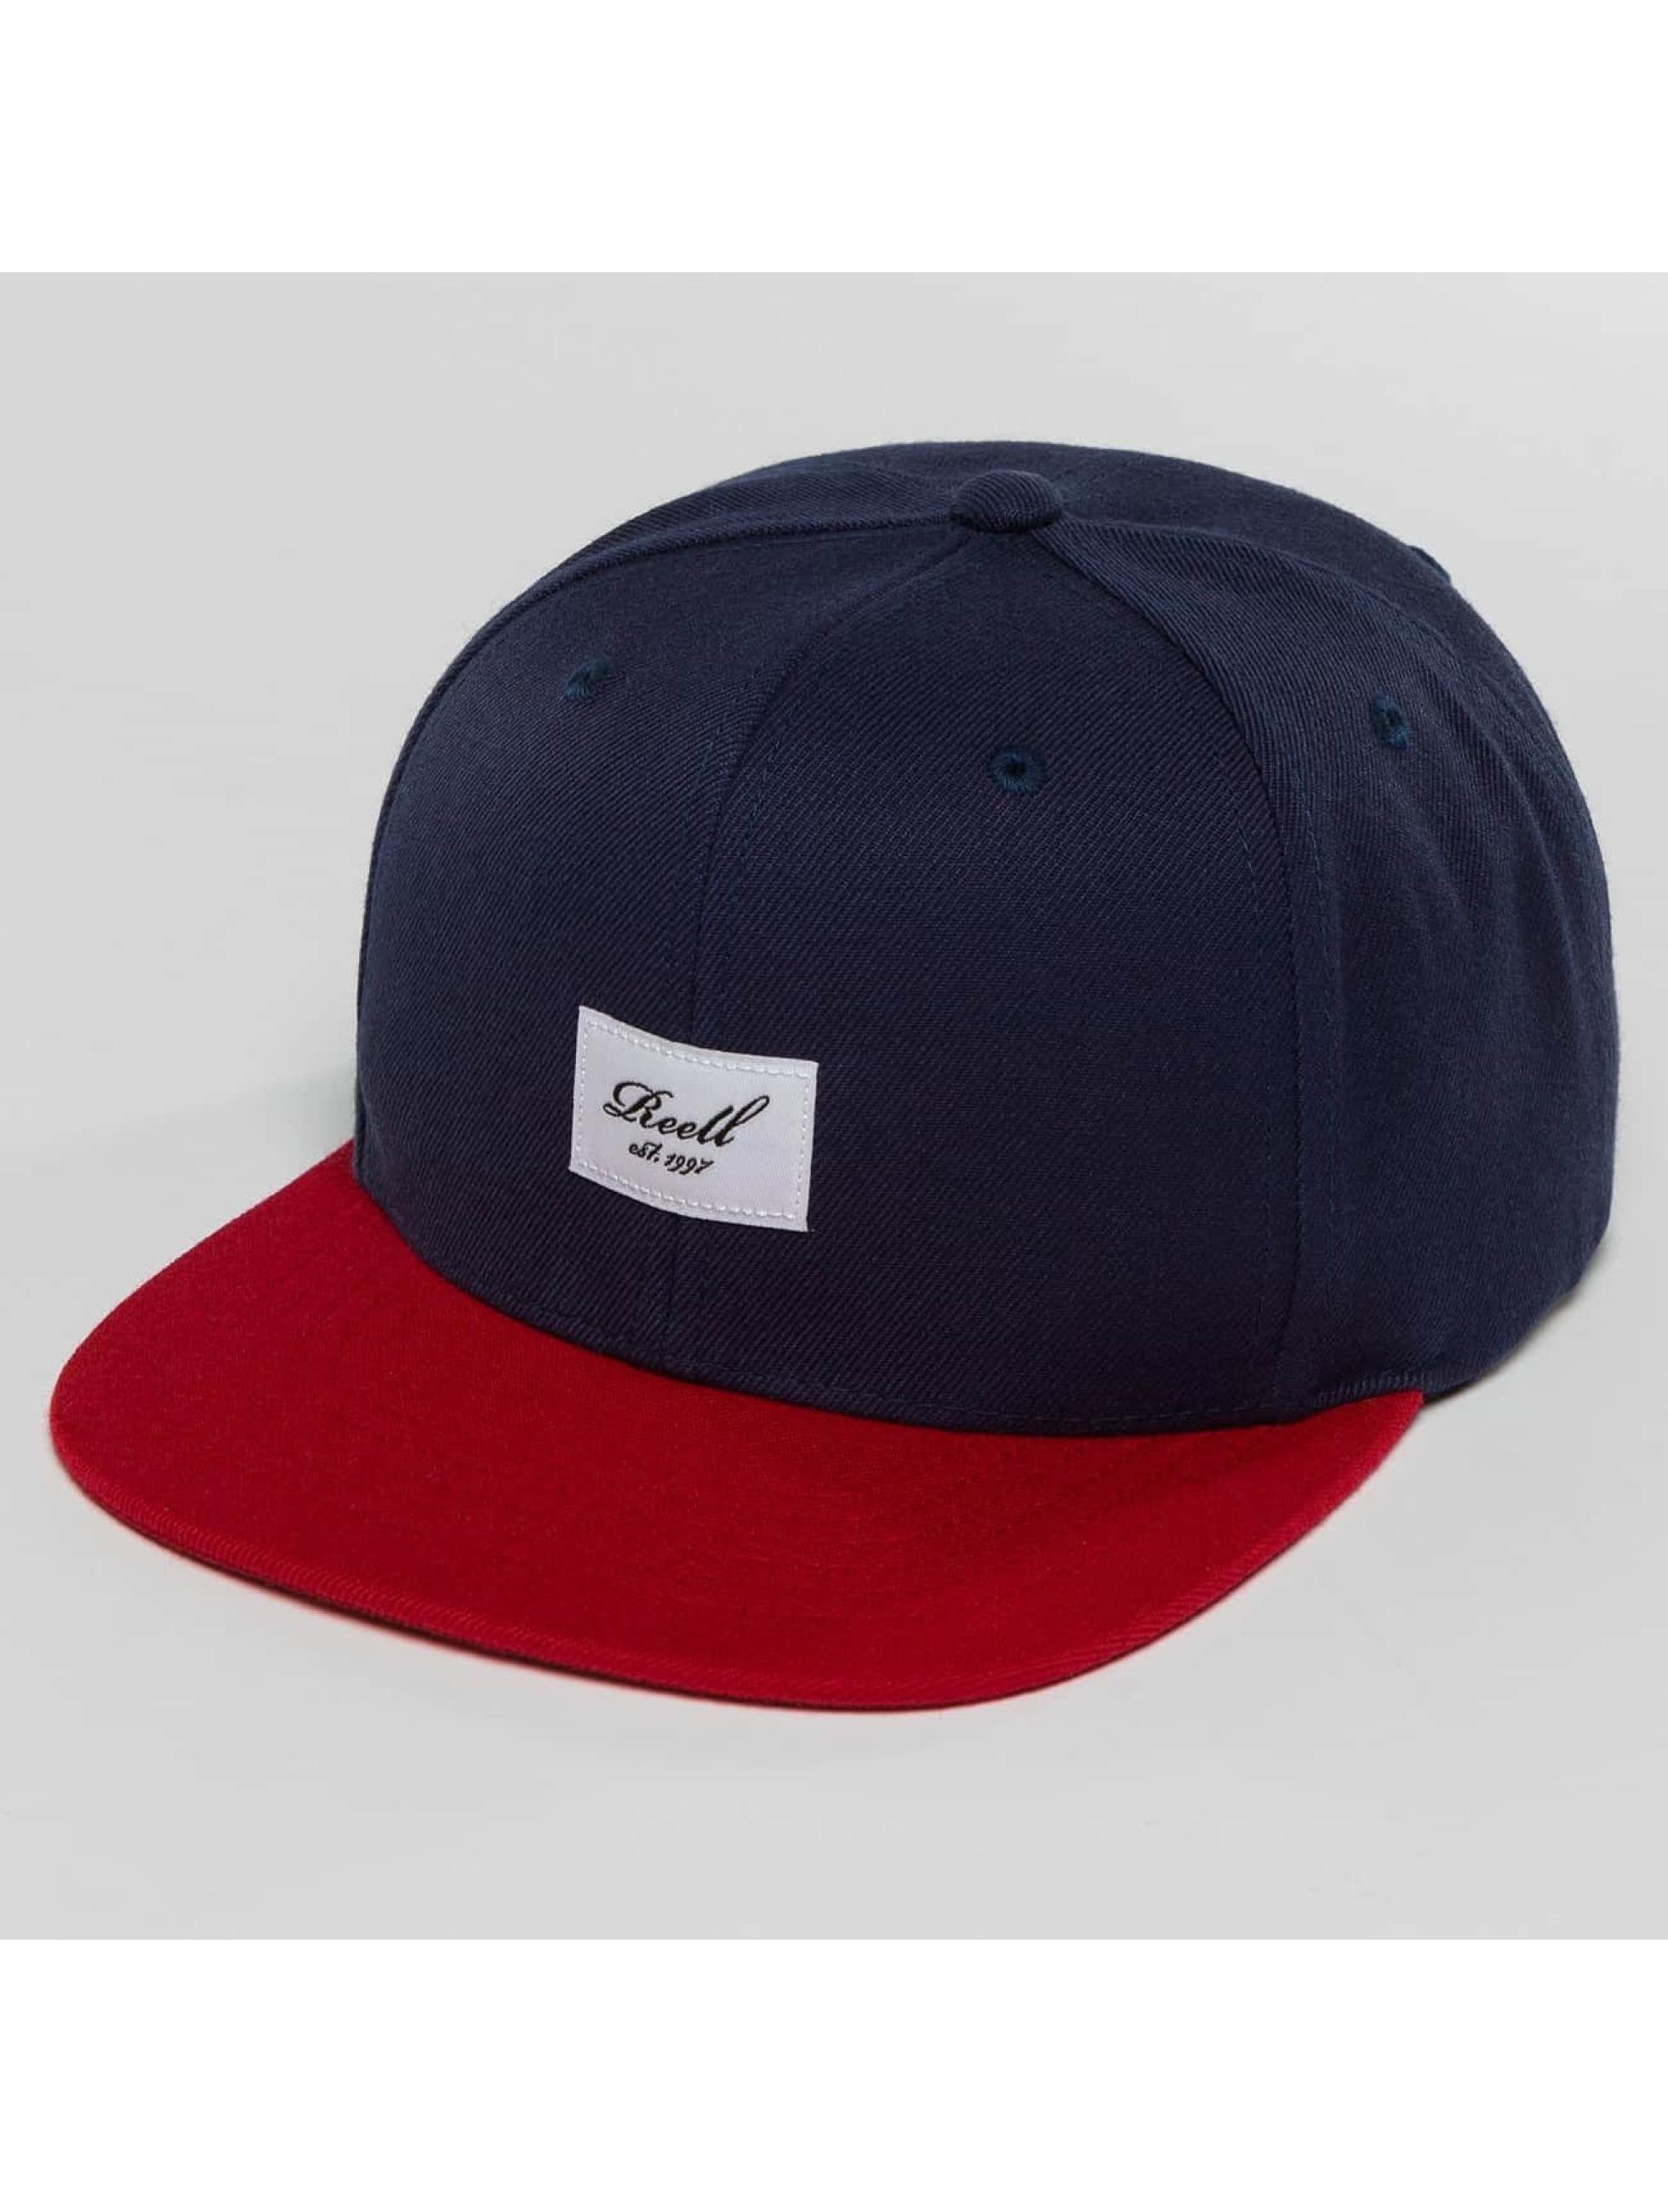 Reell Jeans Snapback Caps 1402004050431 niebieski